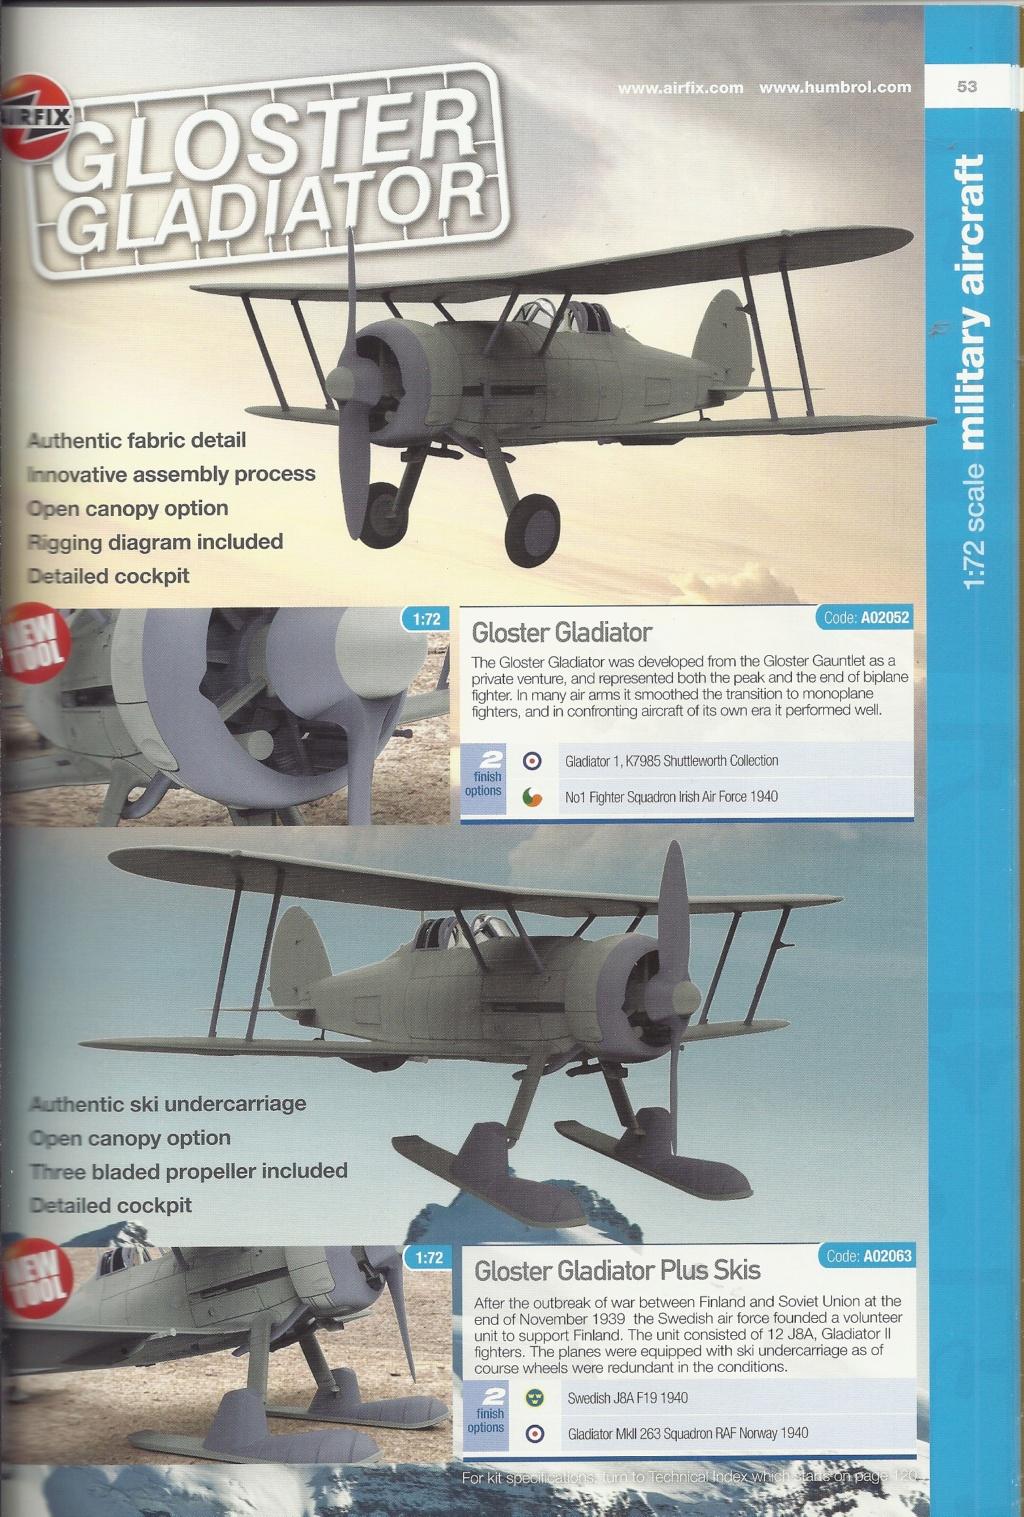 [AIRFIX 2013] Catalogue 2013 Airf1568